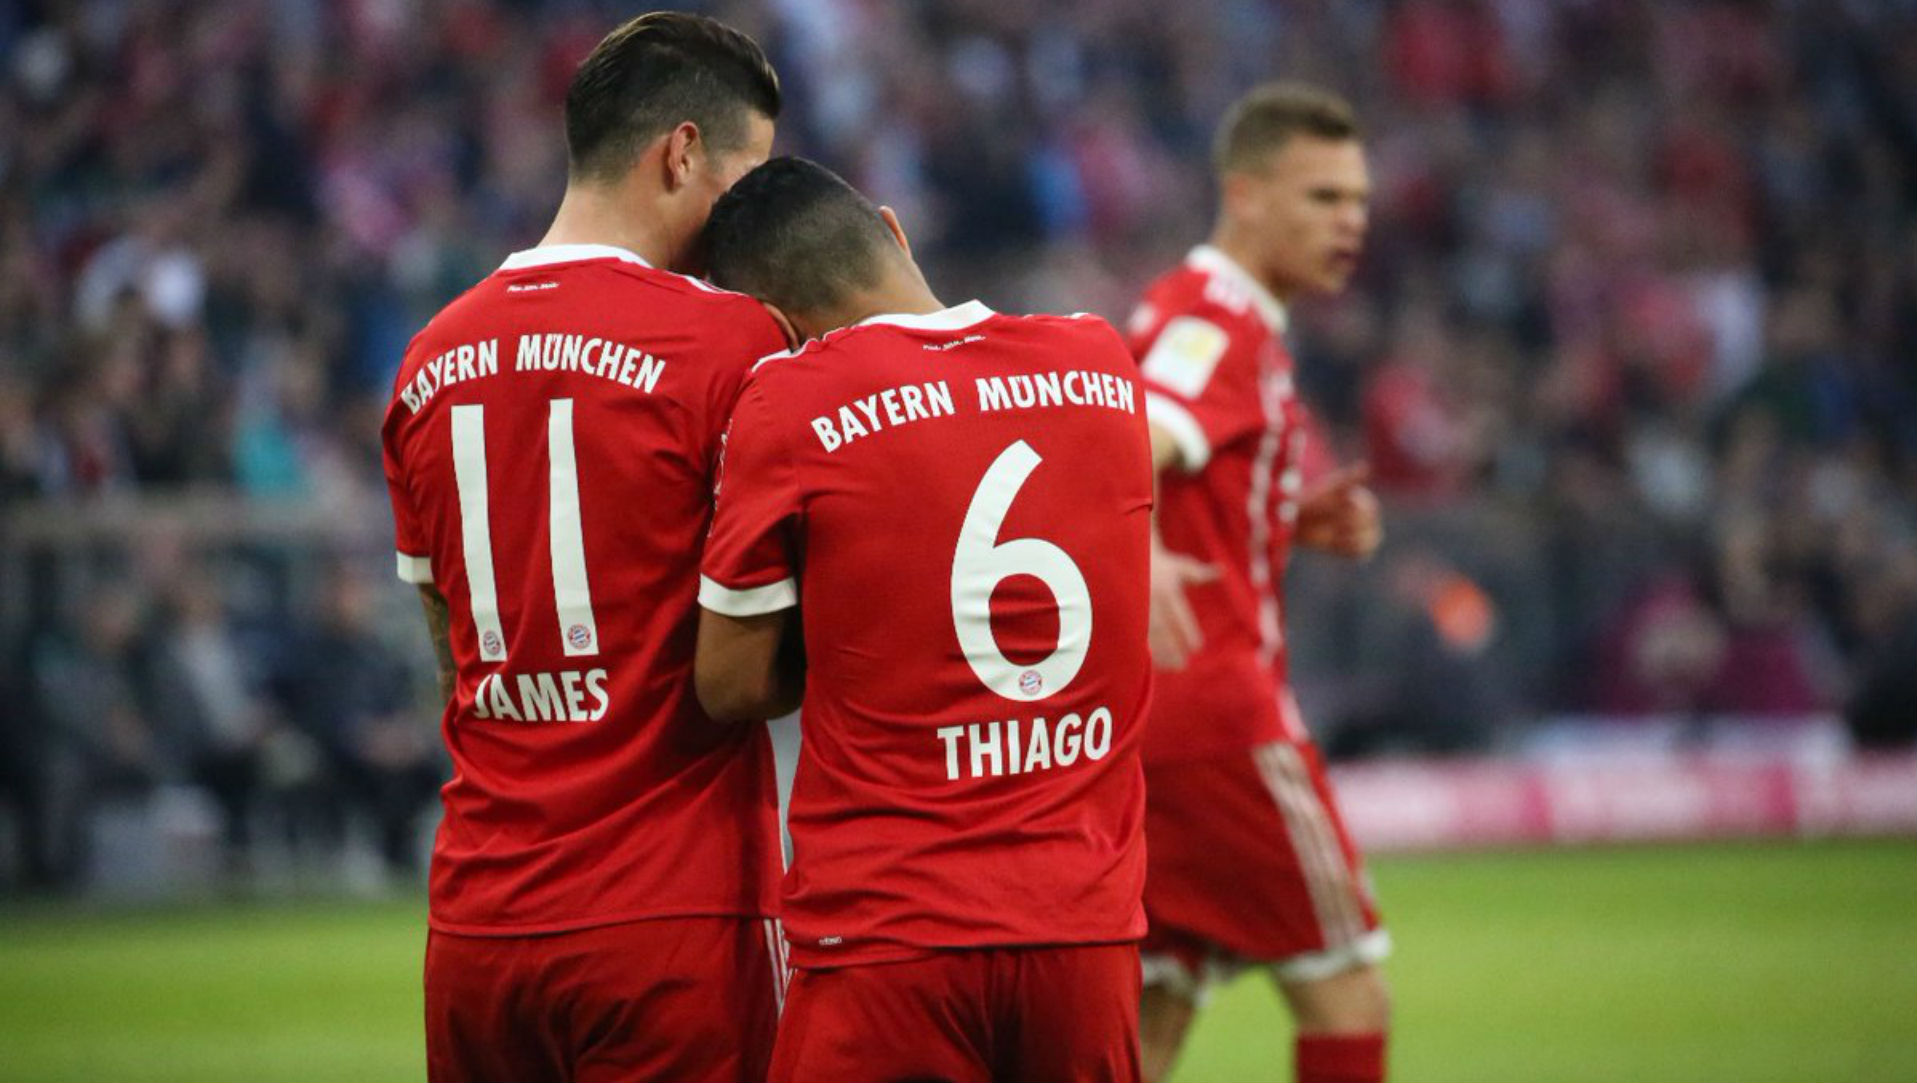 140418 James Rodríguez Thiago Alcántara Bayern Münich - Borussia Mönchengladbach